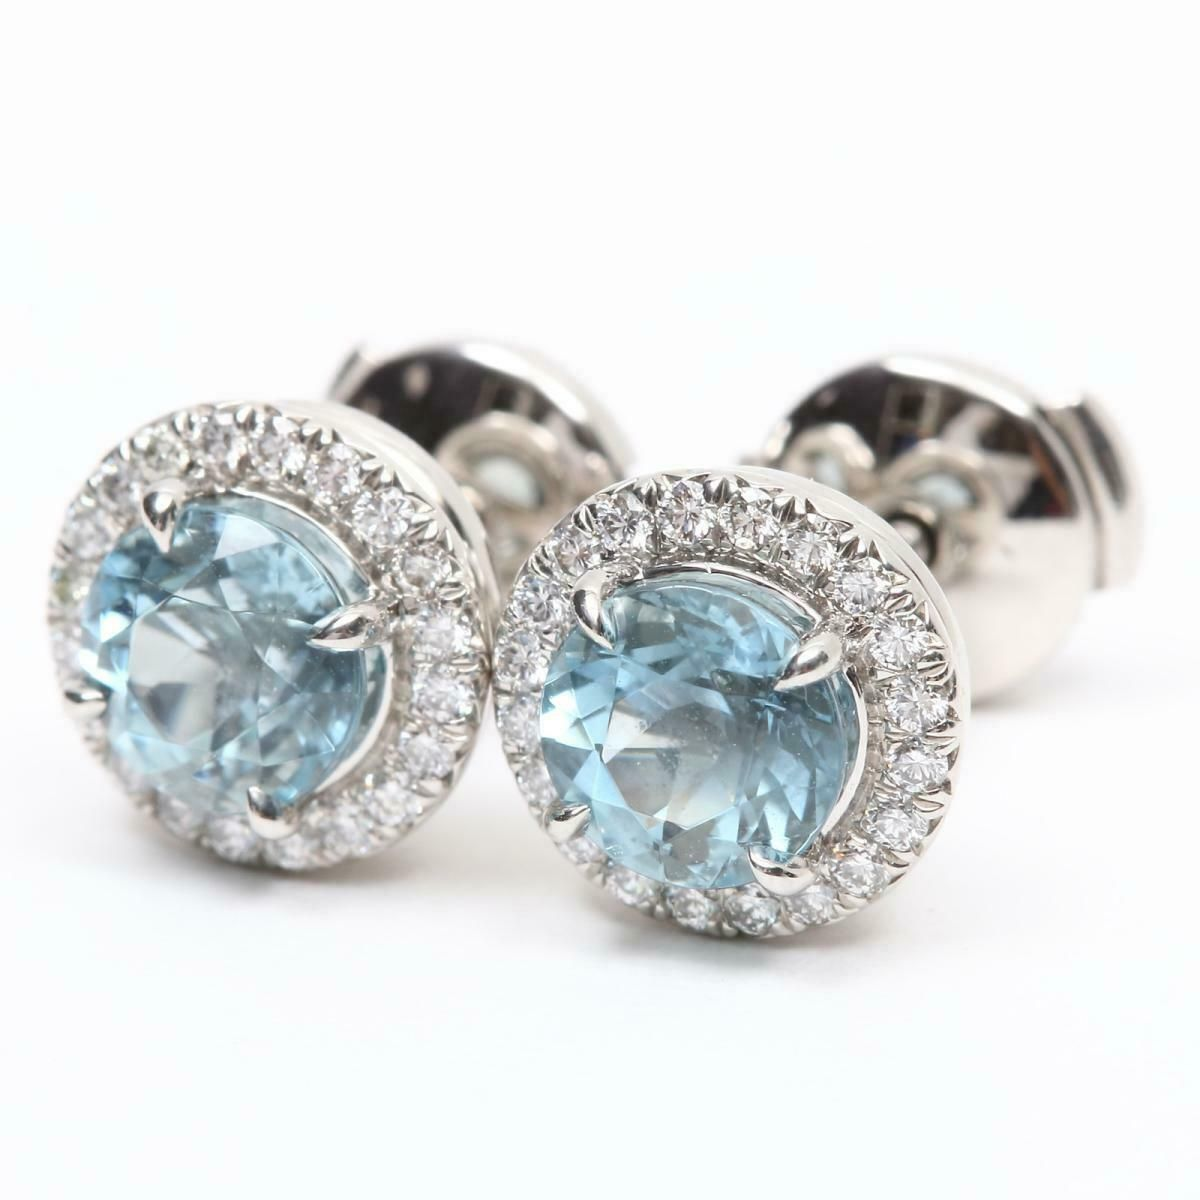 Authentic TIFFANY&CO Sorrest Aquamarine Diamond Earrings